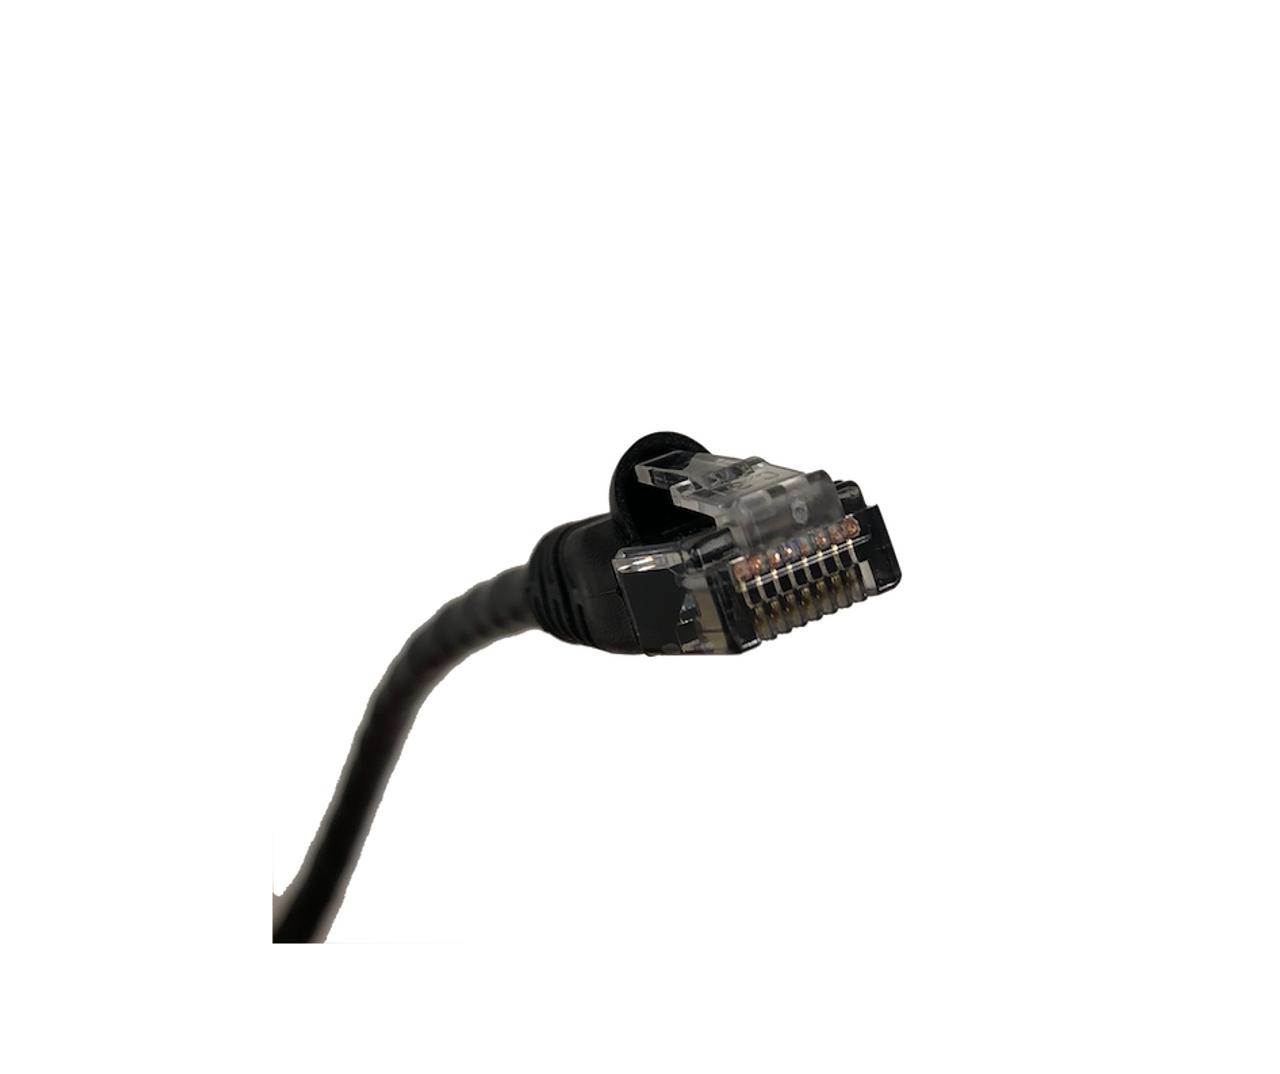 Category 5E UTP RJ45 Patch Cable Black - 14 ft